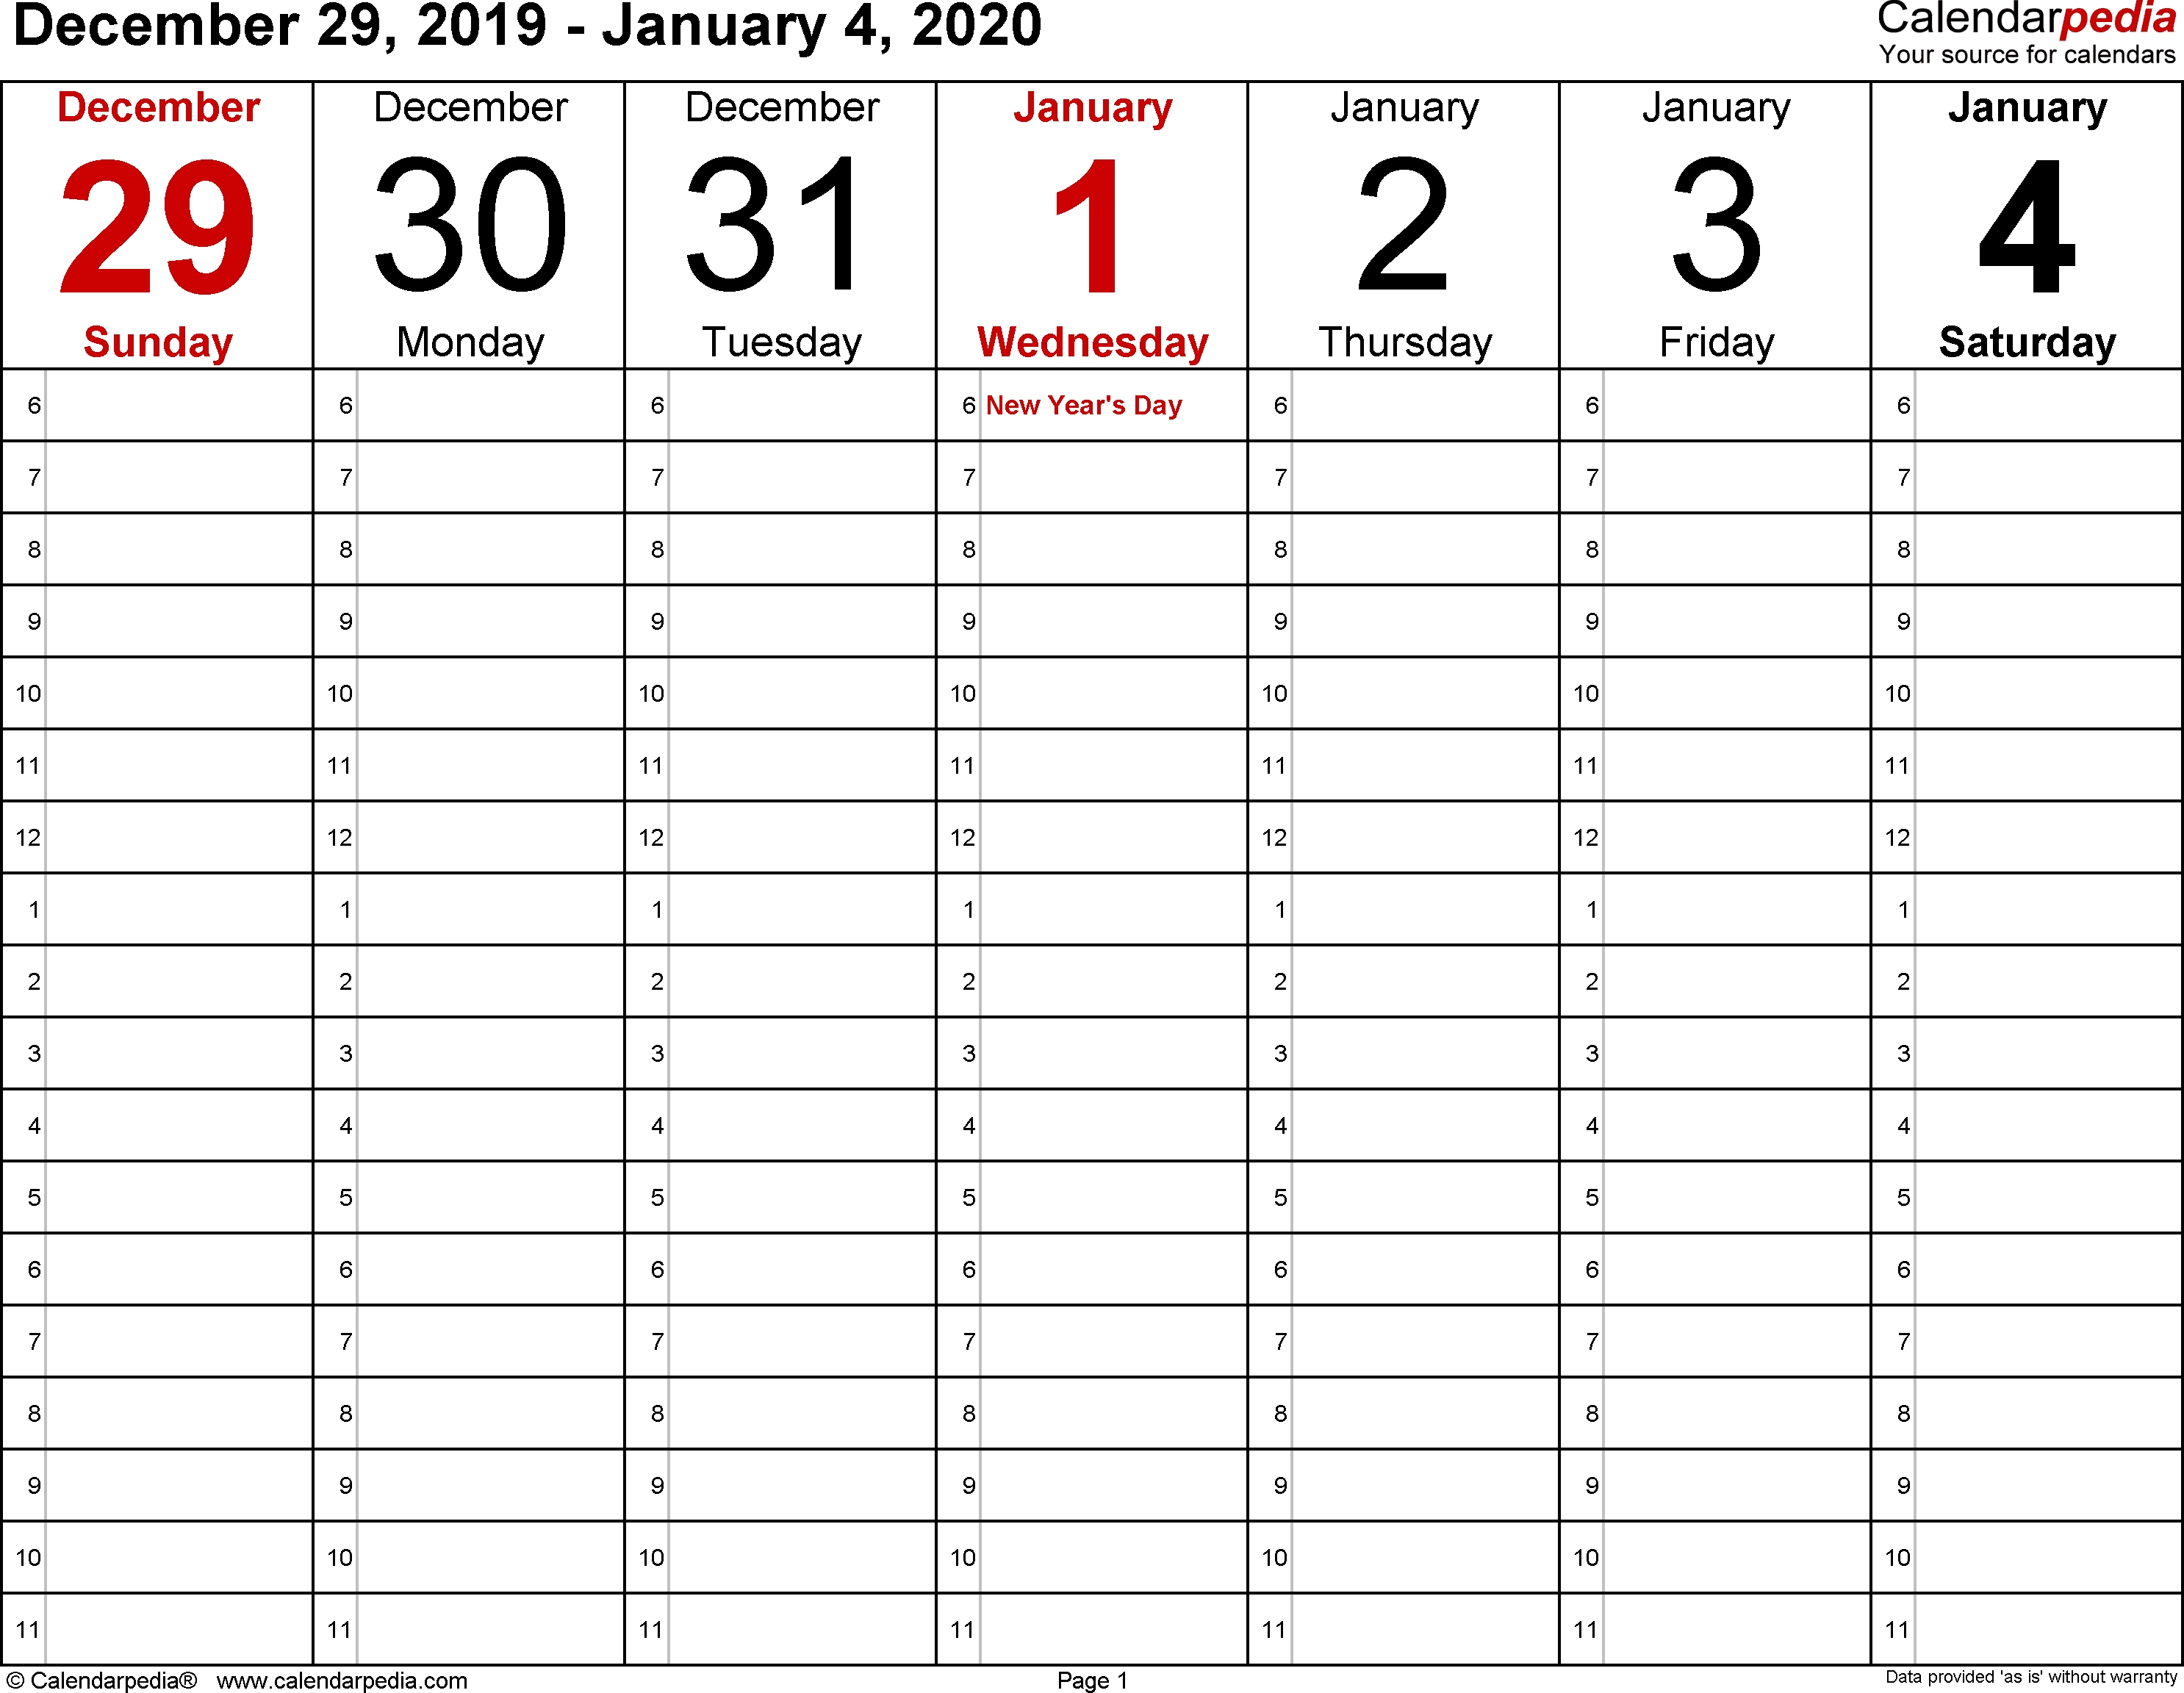 Weekly Calendar 2020 For Pdf - 12 Free Printable Templates throughout Employee Attendance Calendar 2020 Prntable